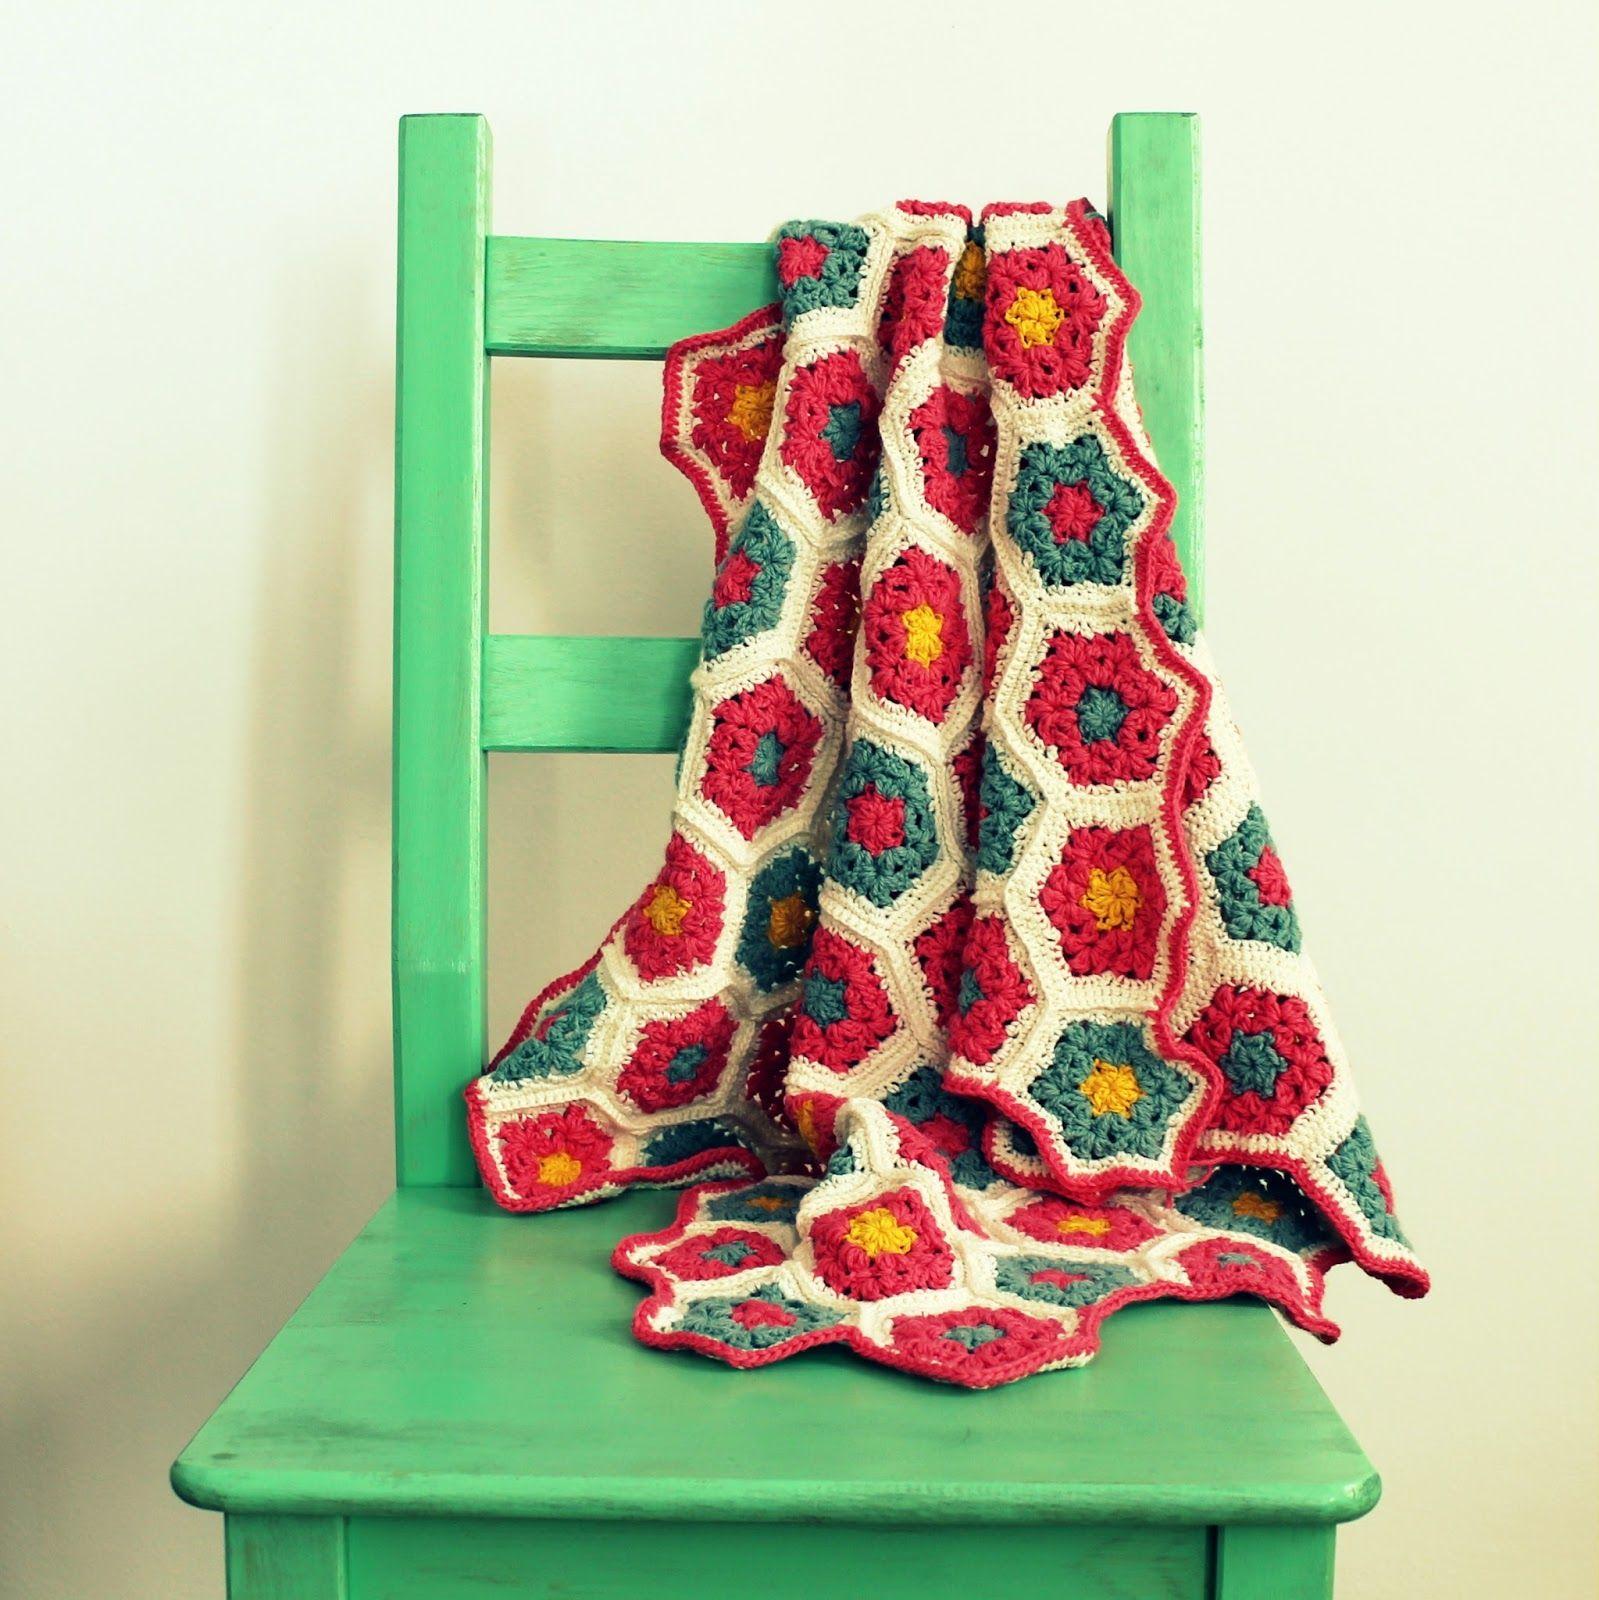 Ahuyama Crochet: Colcha de Hexágonos a Crochet PASO A PASO